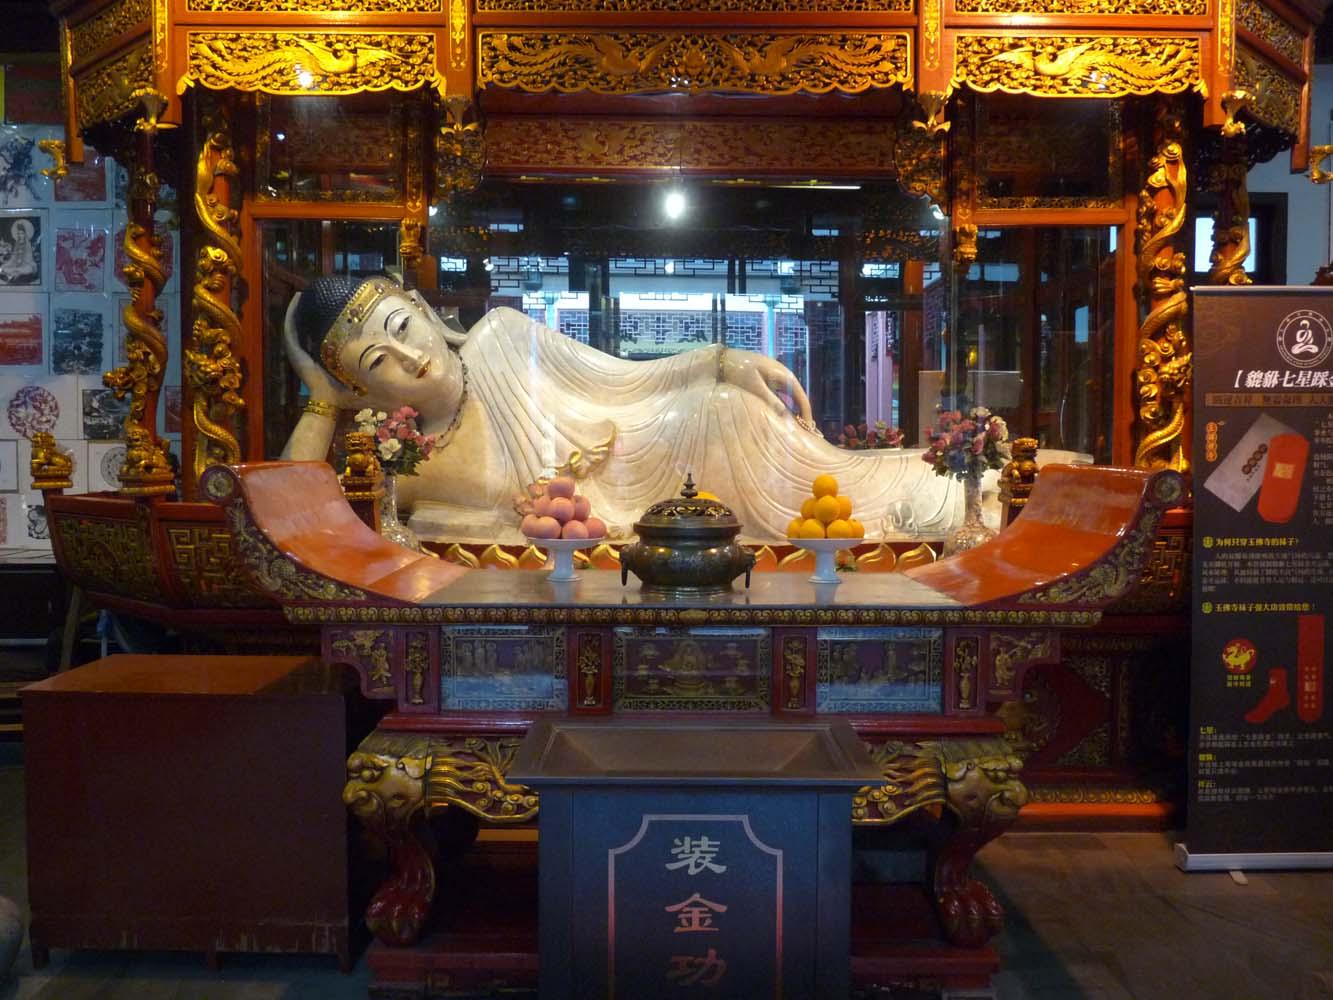 LCGR Jade Buddha Temple Shanghai 2